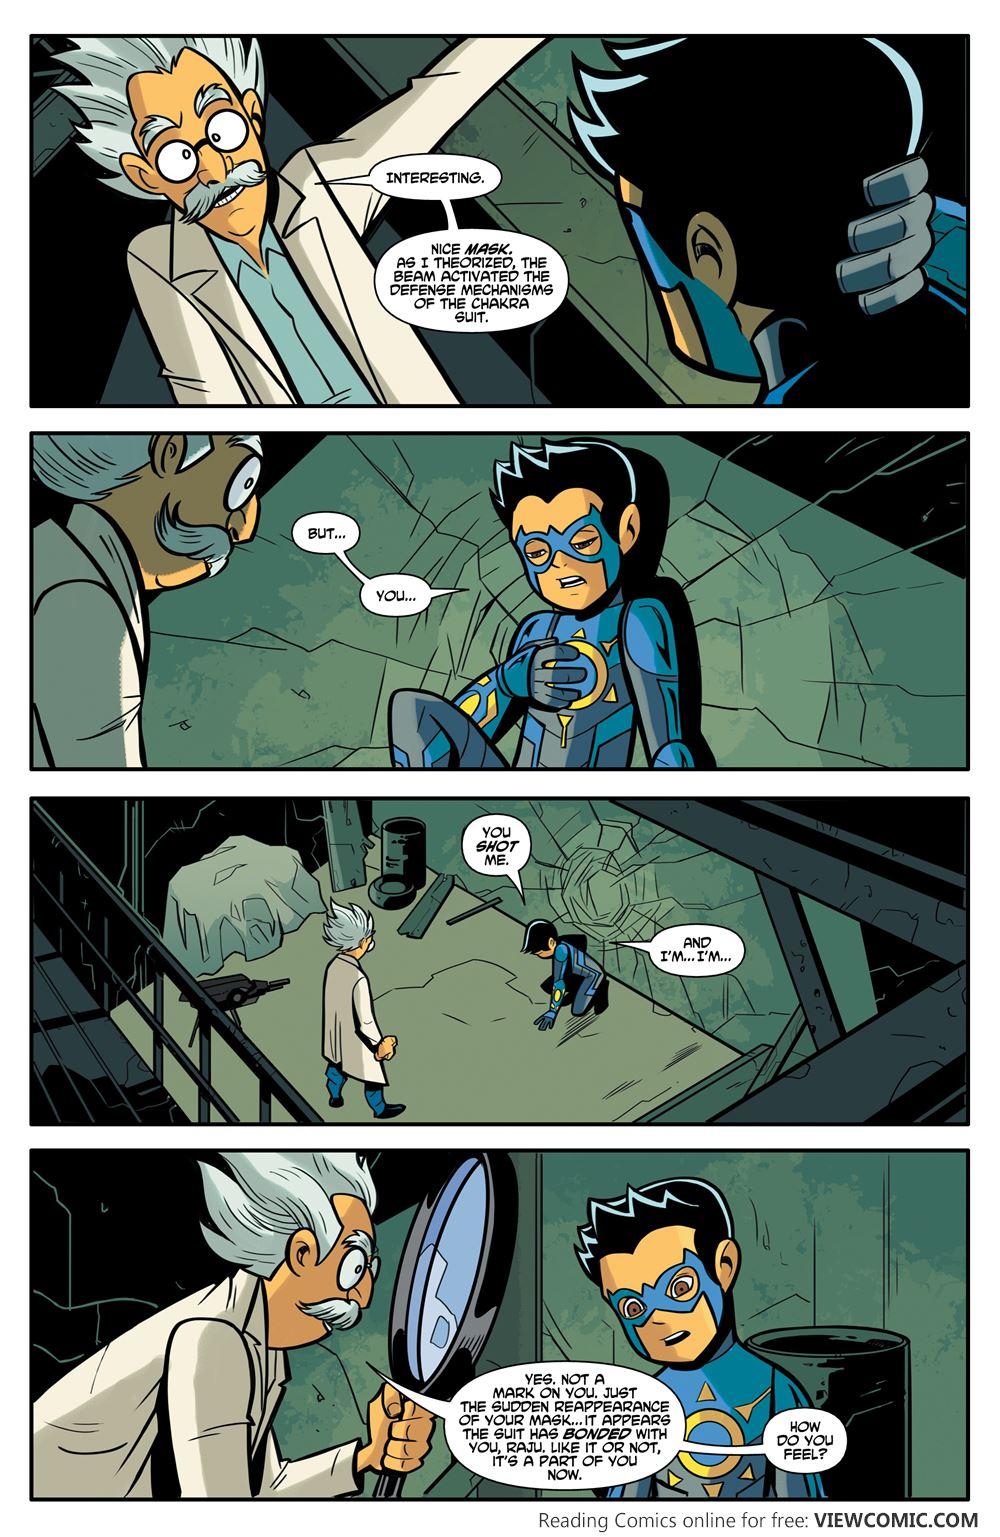 chakra the invincible 004 2015 viewcomic reading comics